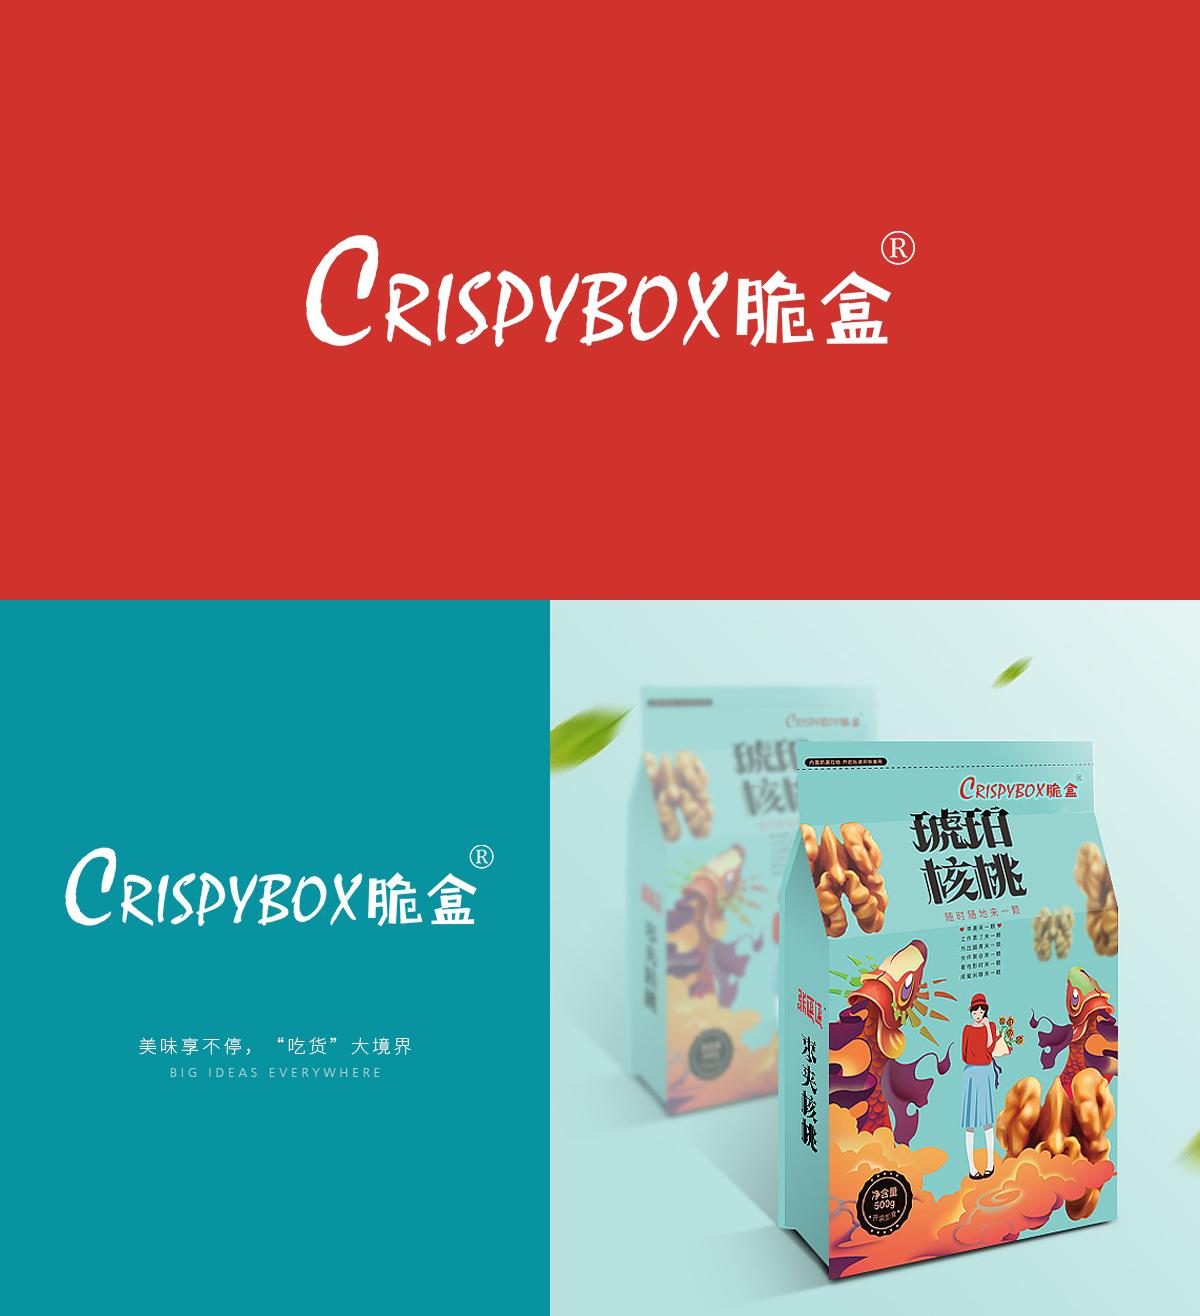 CRISPY BOX 脆盒